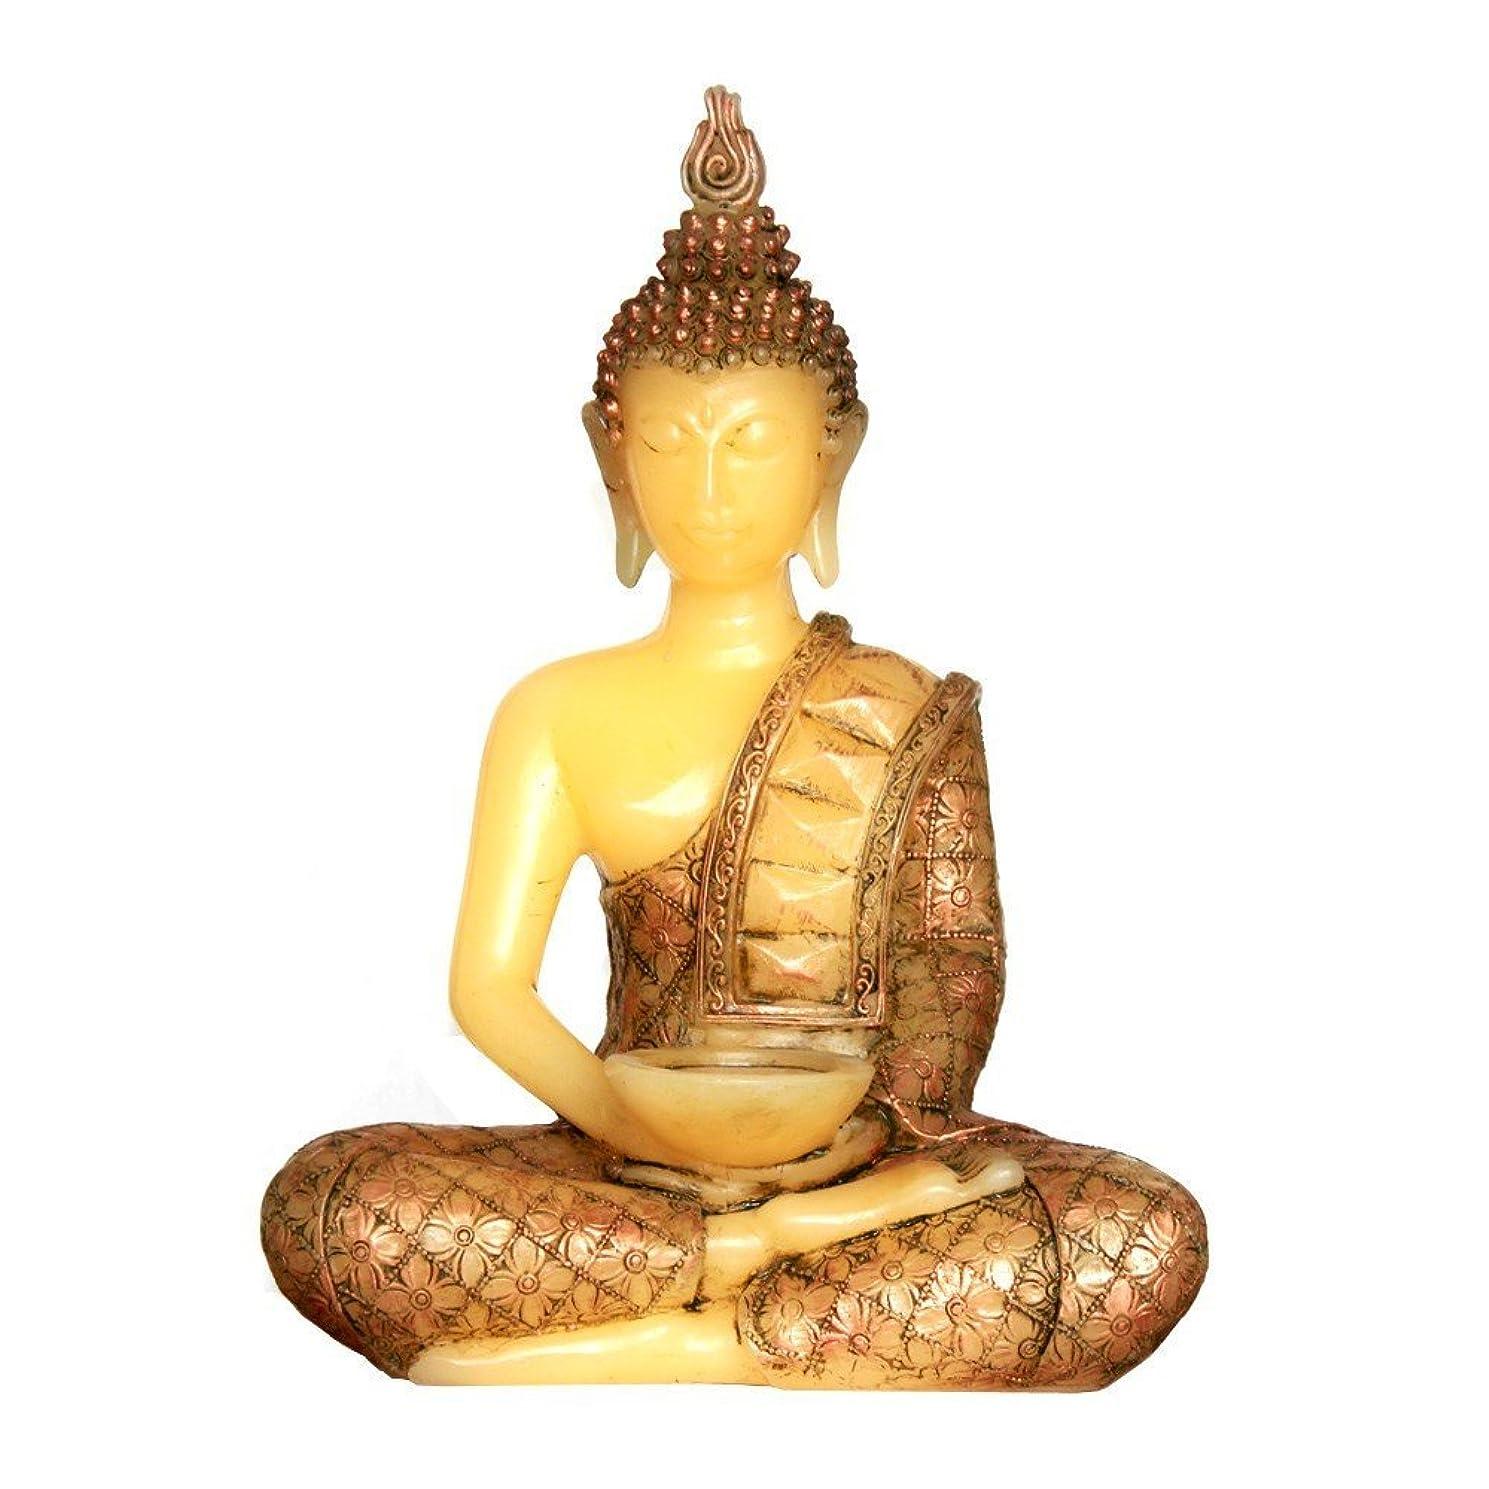 GiveU Meditating Thai Sitting Buddha Decor,Led Light with Timer,13